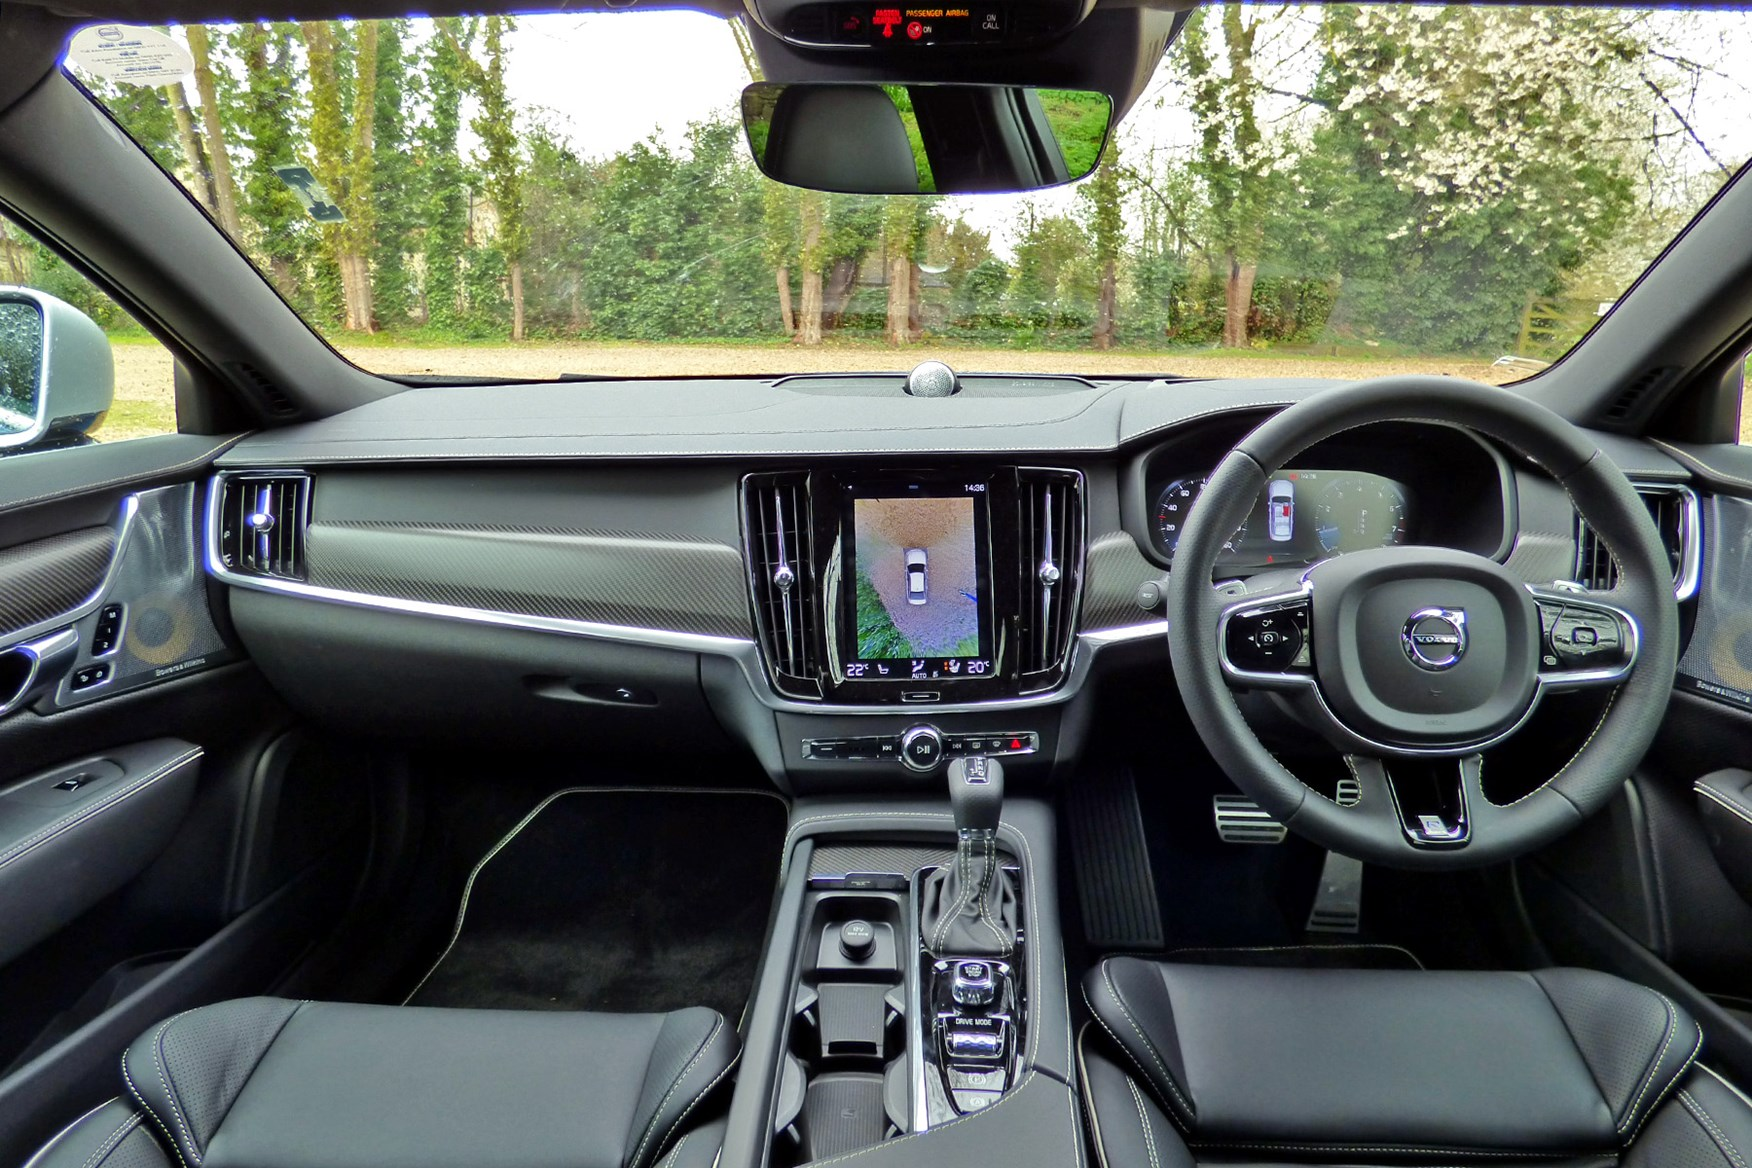 2016 Volvo S90 dashboard